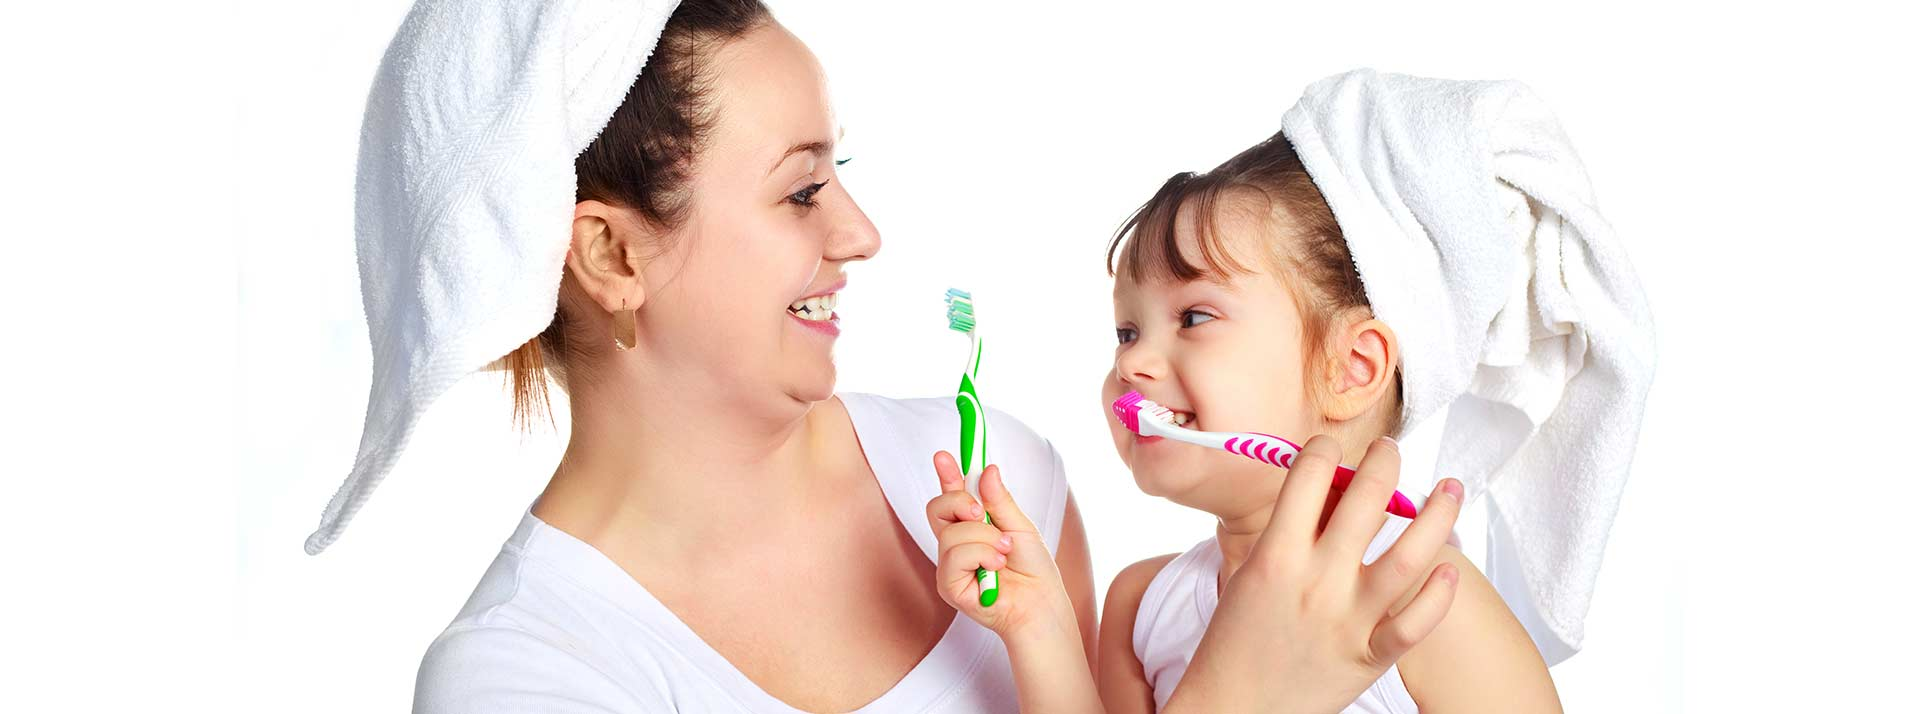 Chinook Centre Dental Hygiene